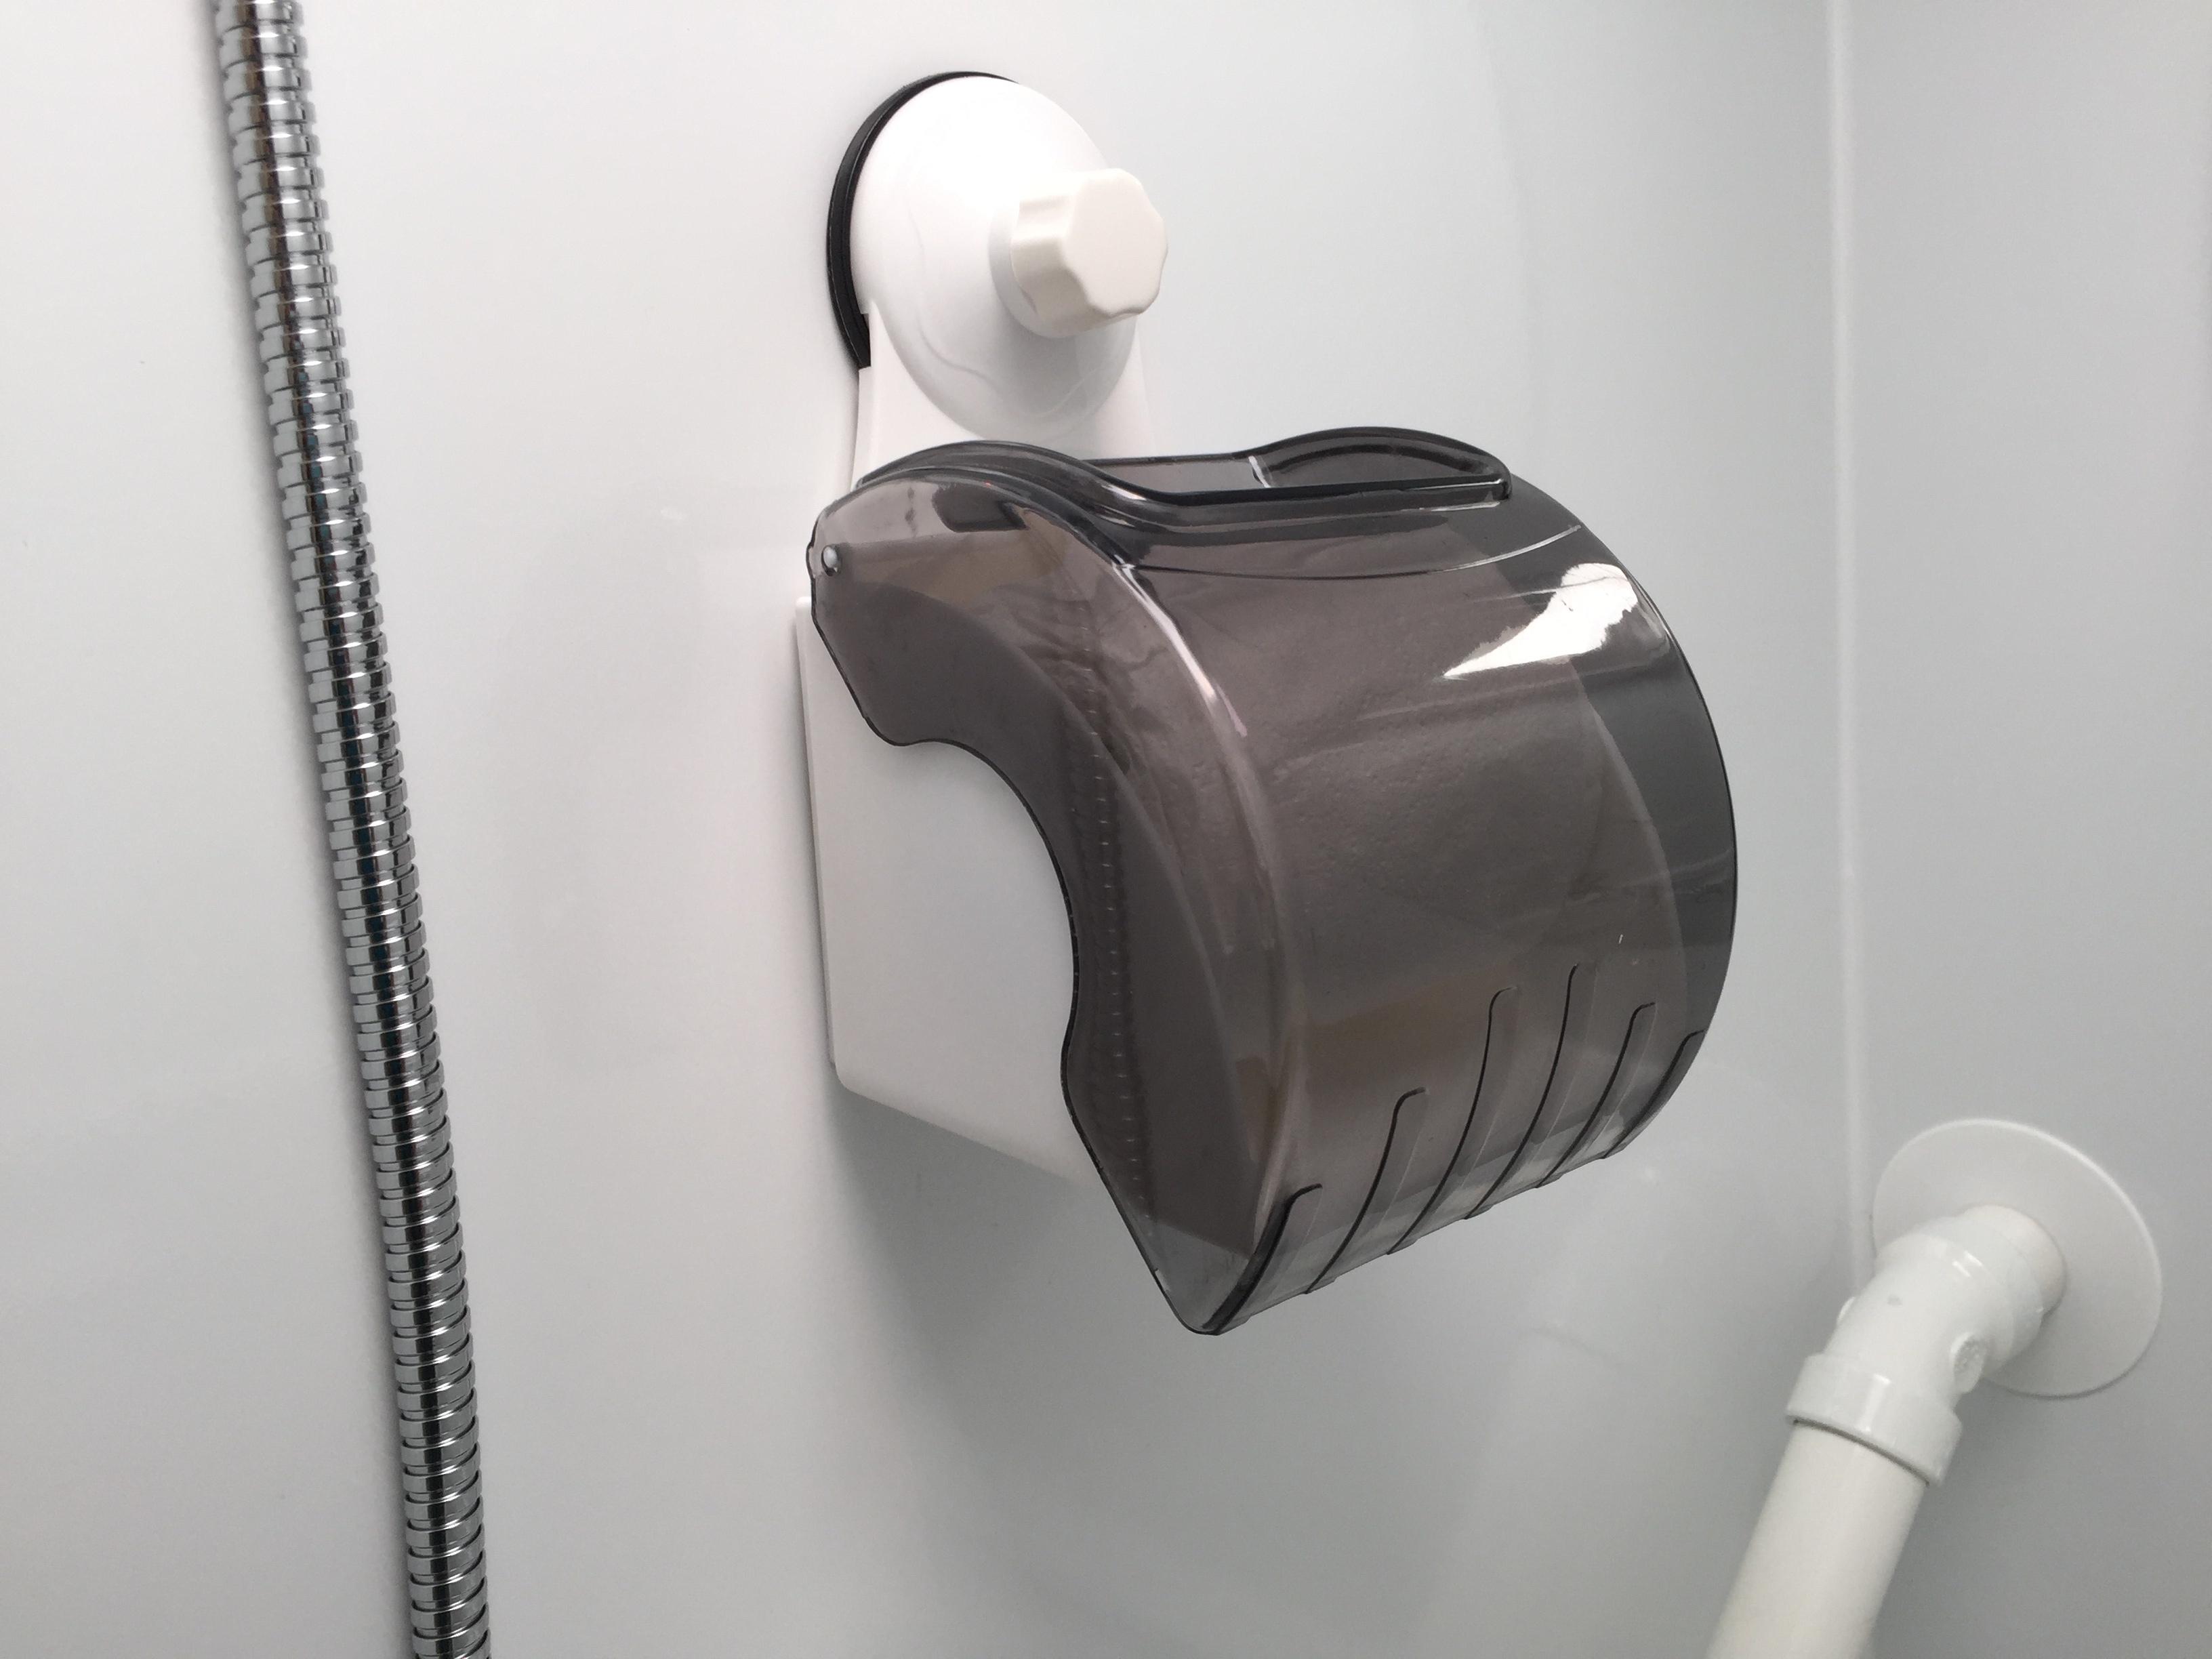 Wet Bath Toilet Paper Dispenser